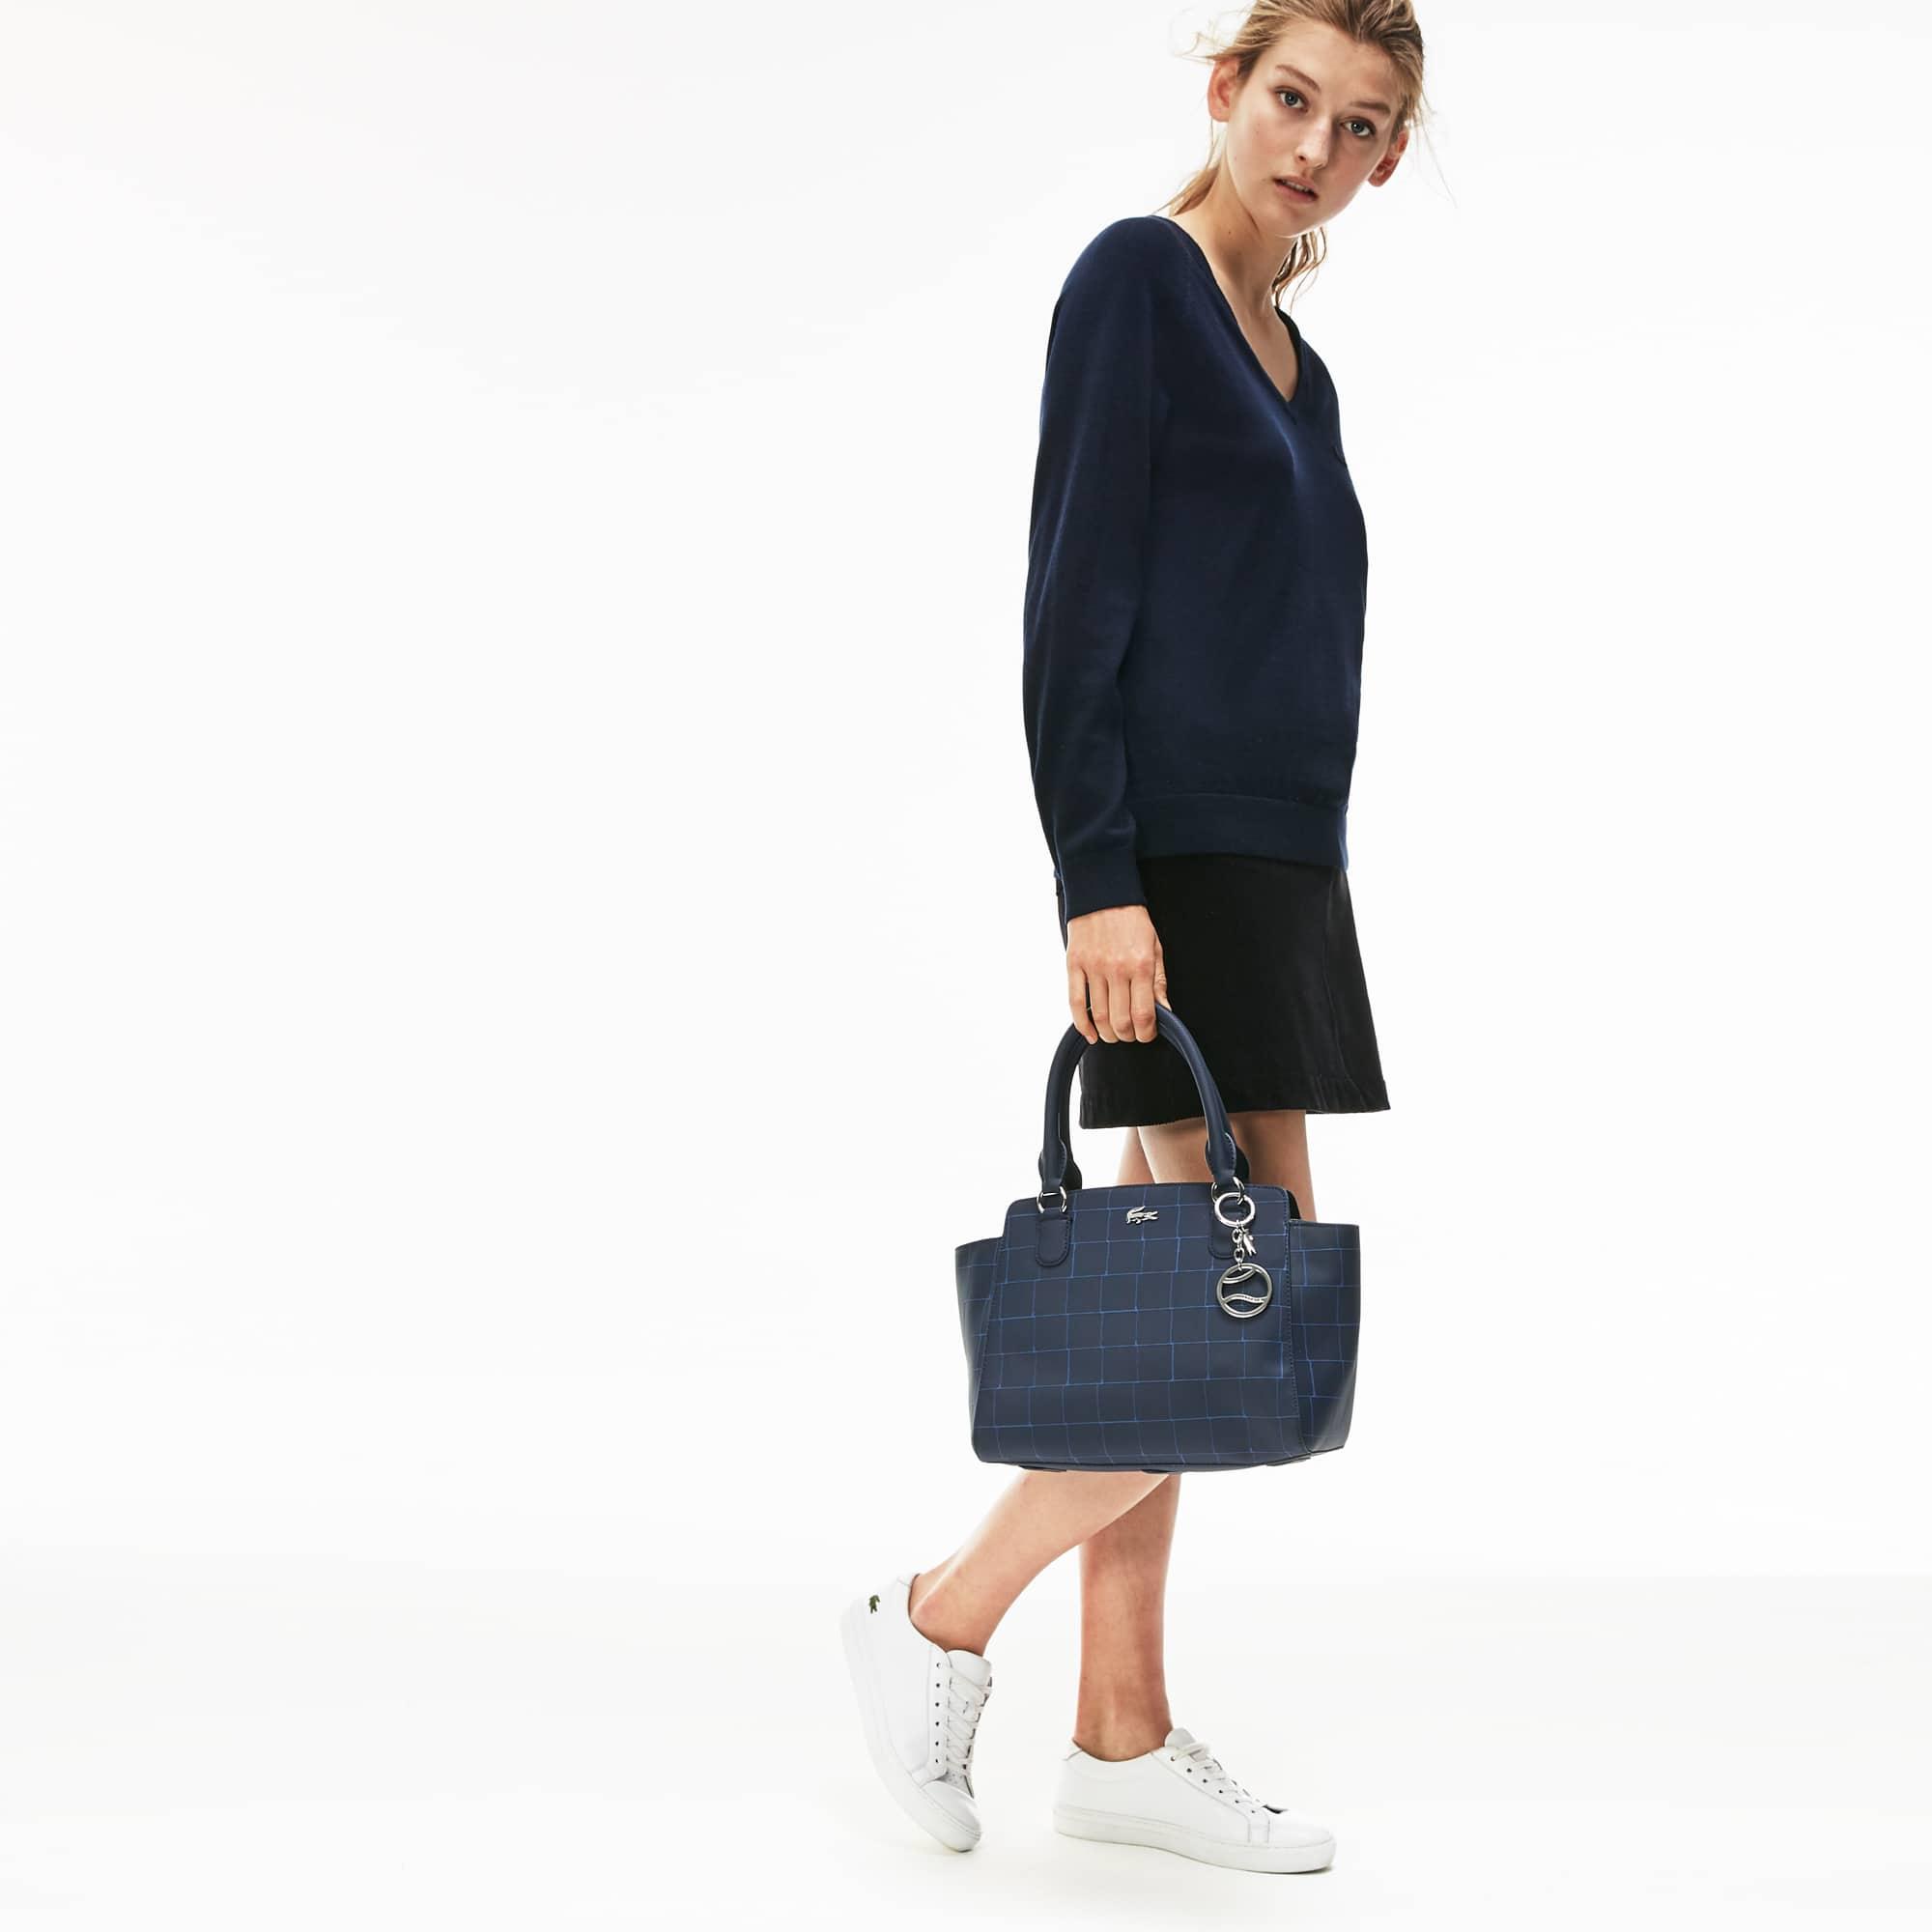 Damen DAILY CLASSIC Tote Bag mit Netzprint